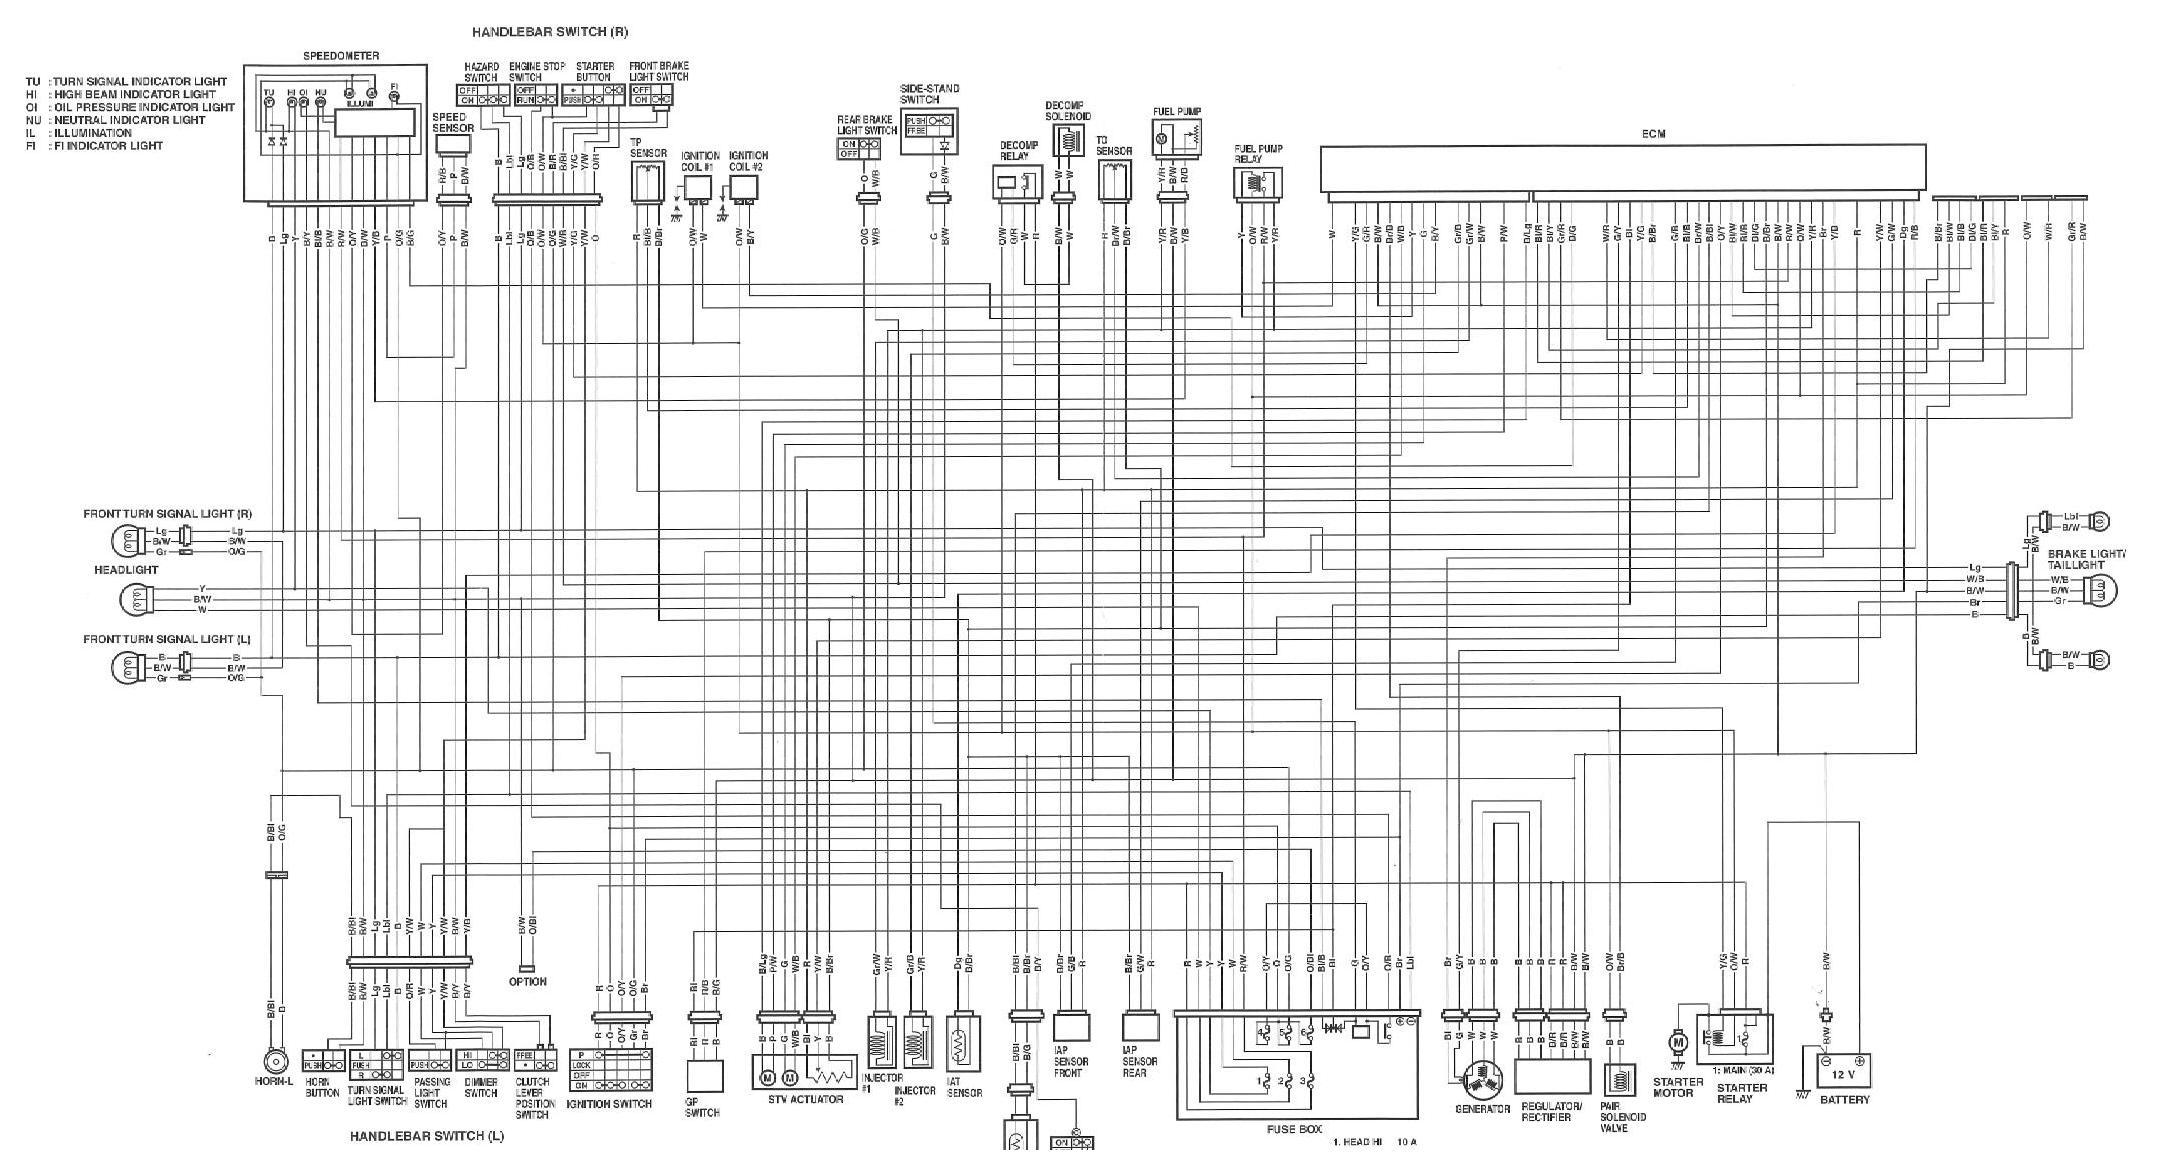 small resolution of vl800 suzuki motorcycle wiring diagrams electrical wiring diagram suzuki vl800 wiring diagram suzuki